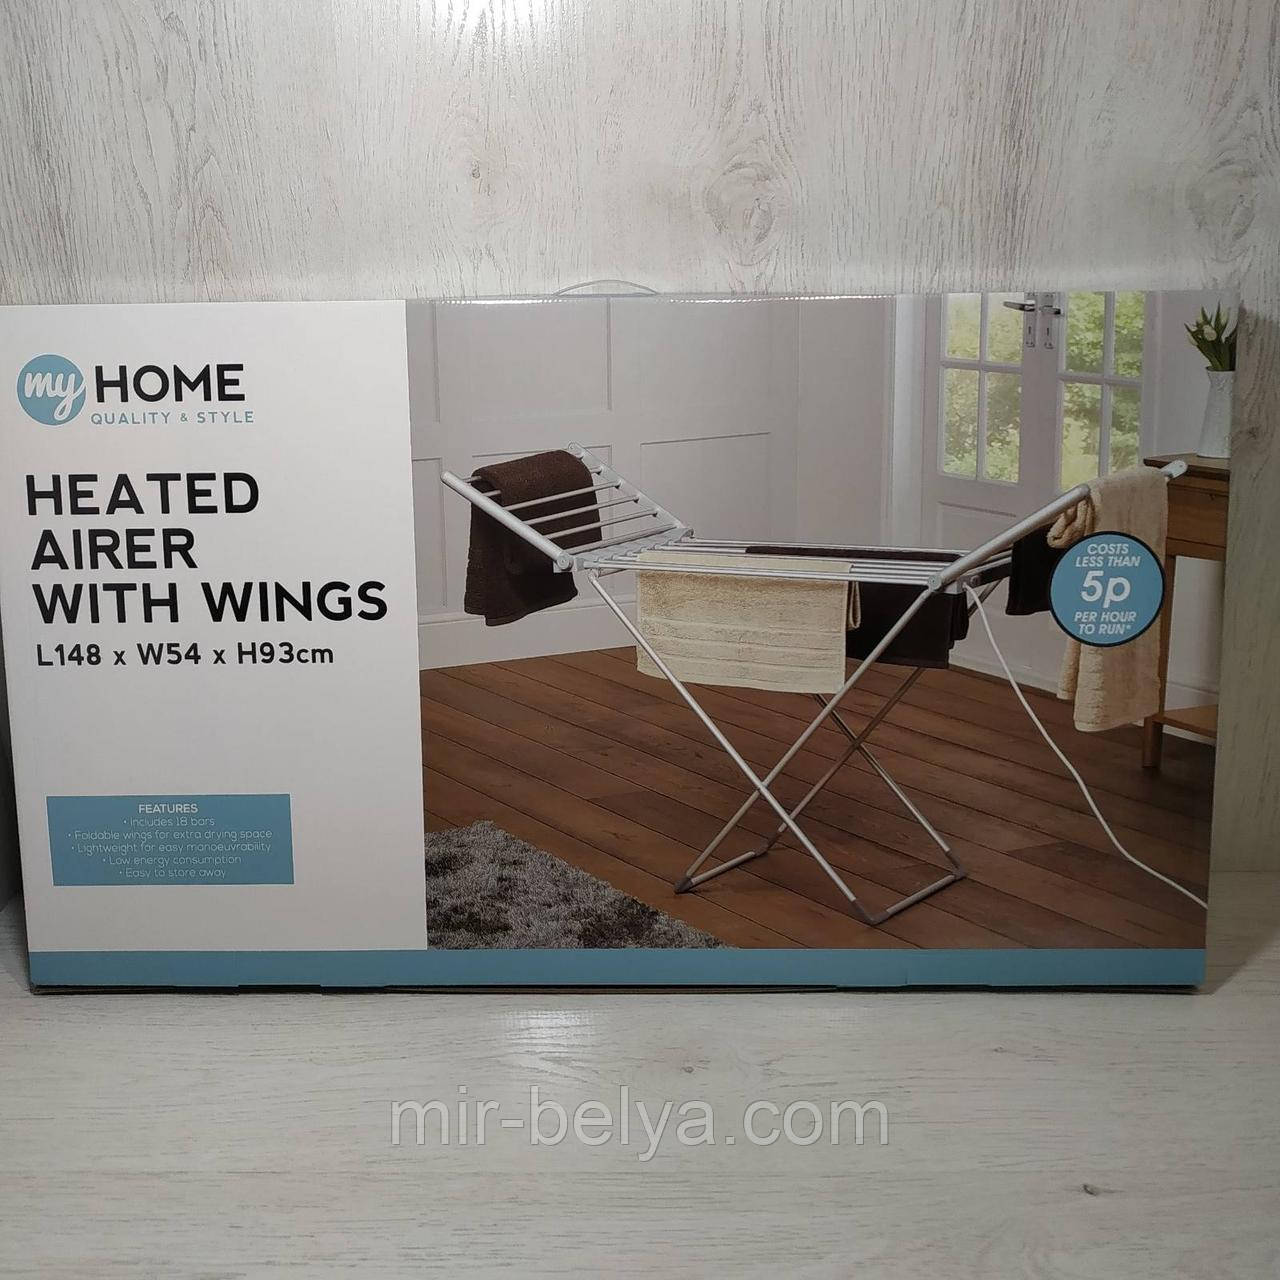 Електрическая сушилка для белья Heated Airer with wing